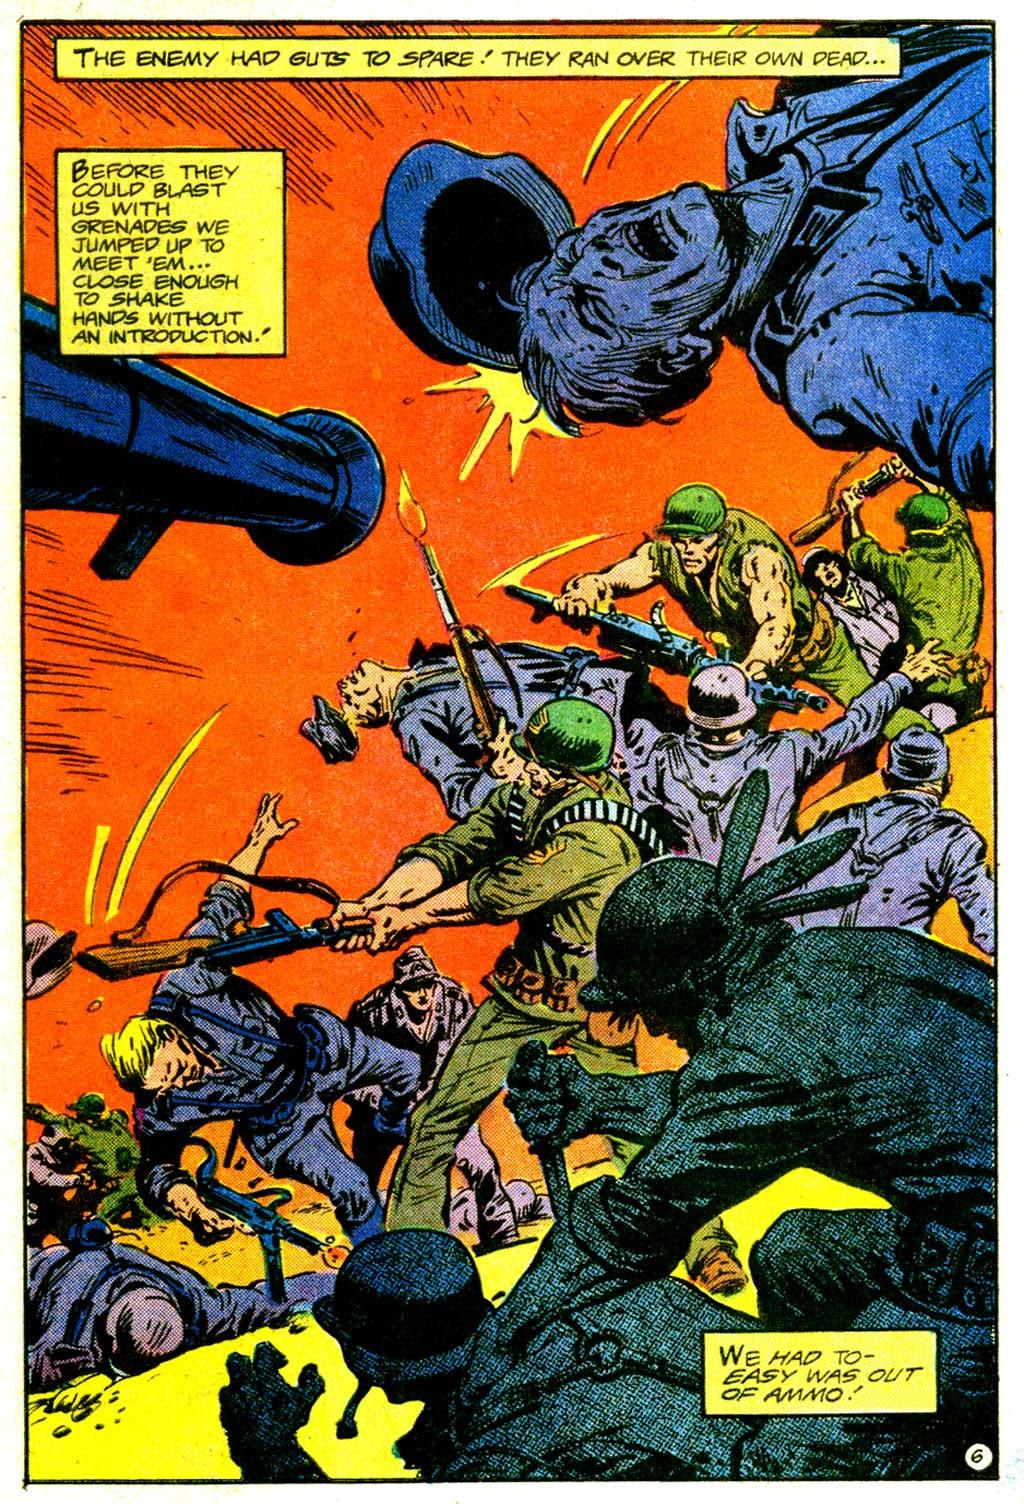 Read online Sgt. Rock comic -  Issue #370 - 10